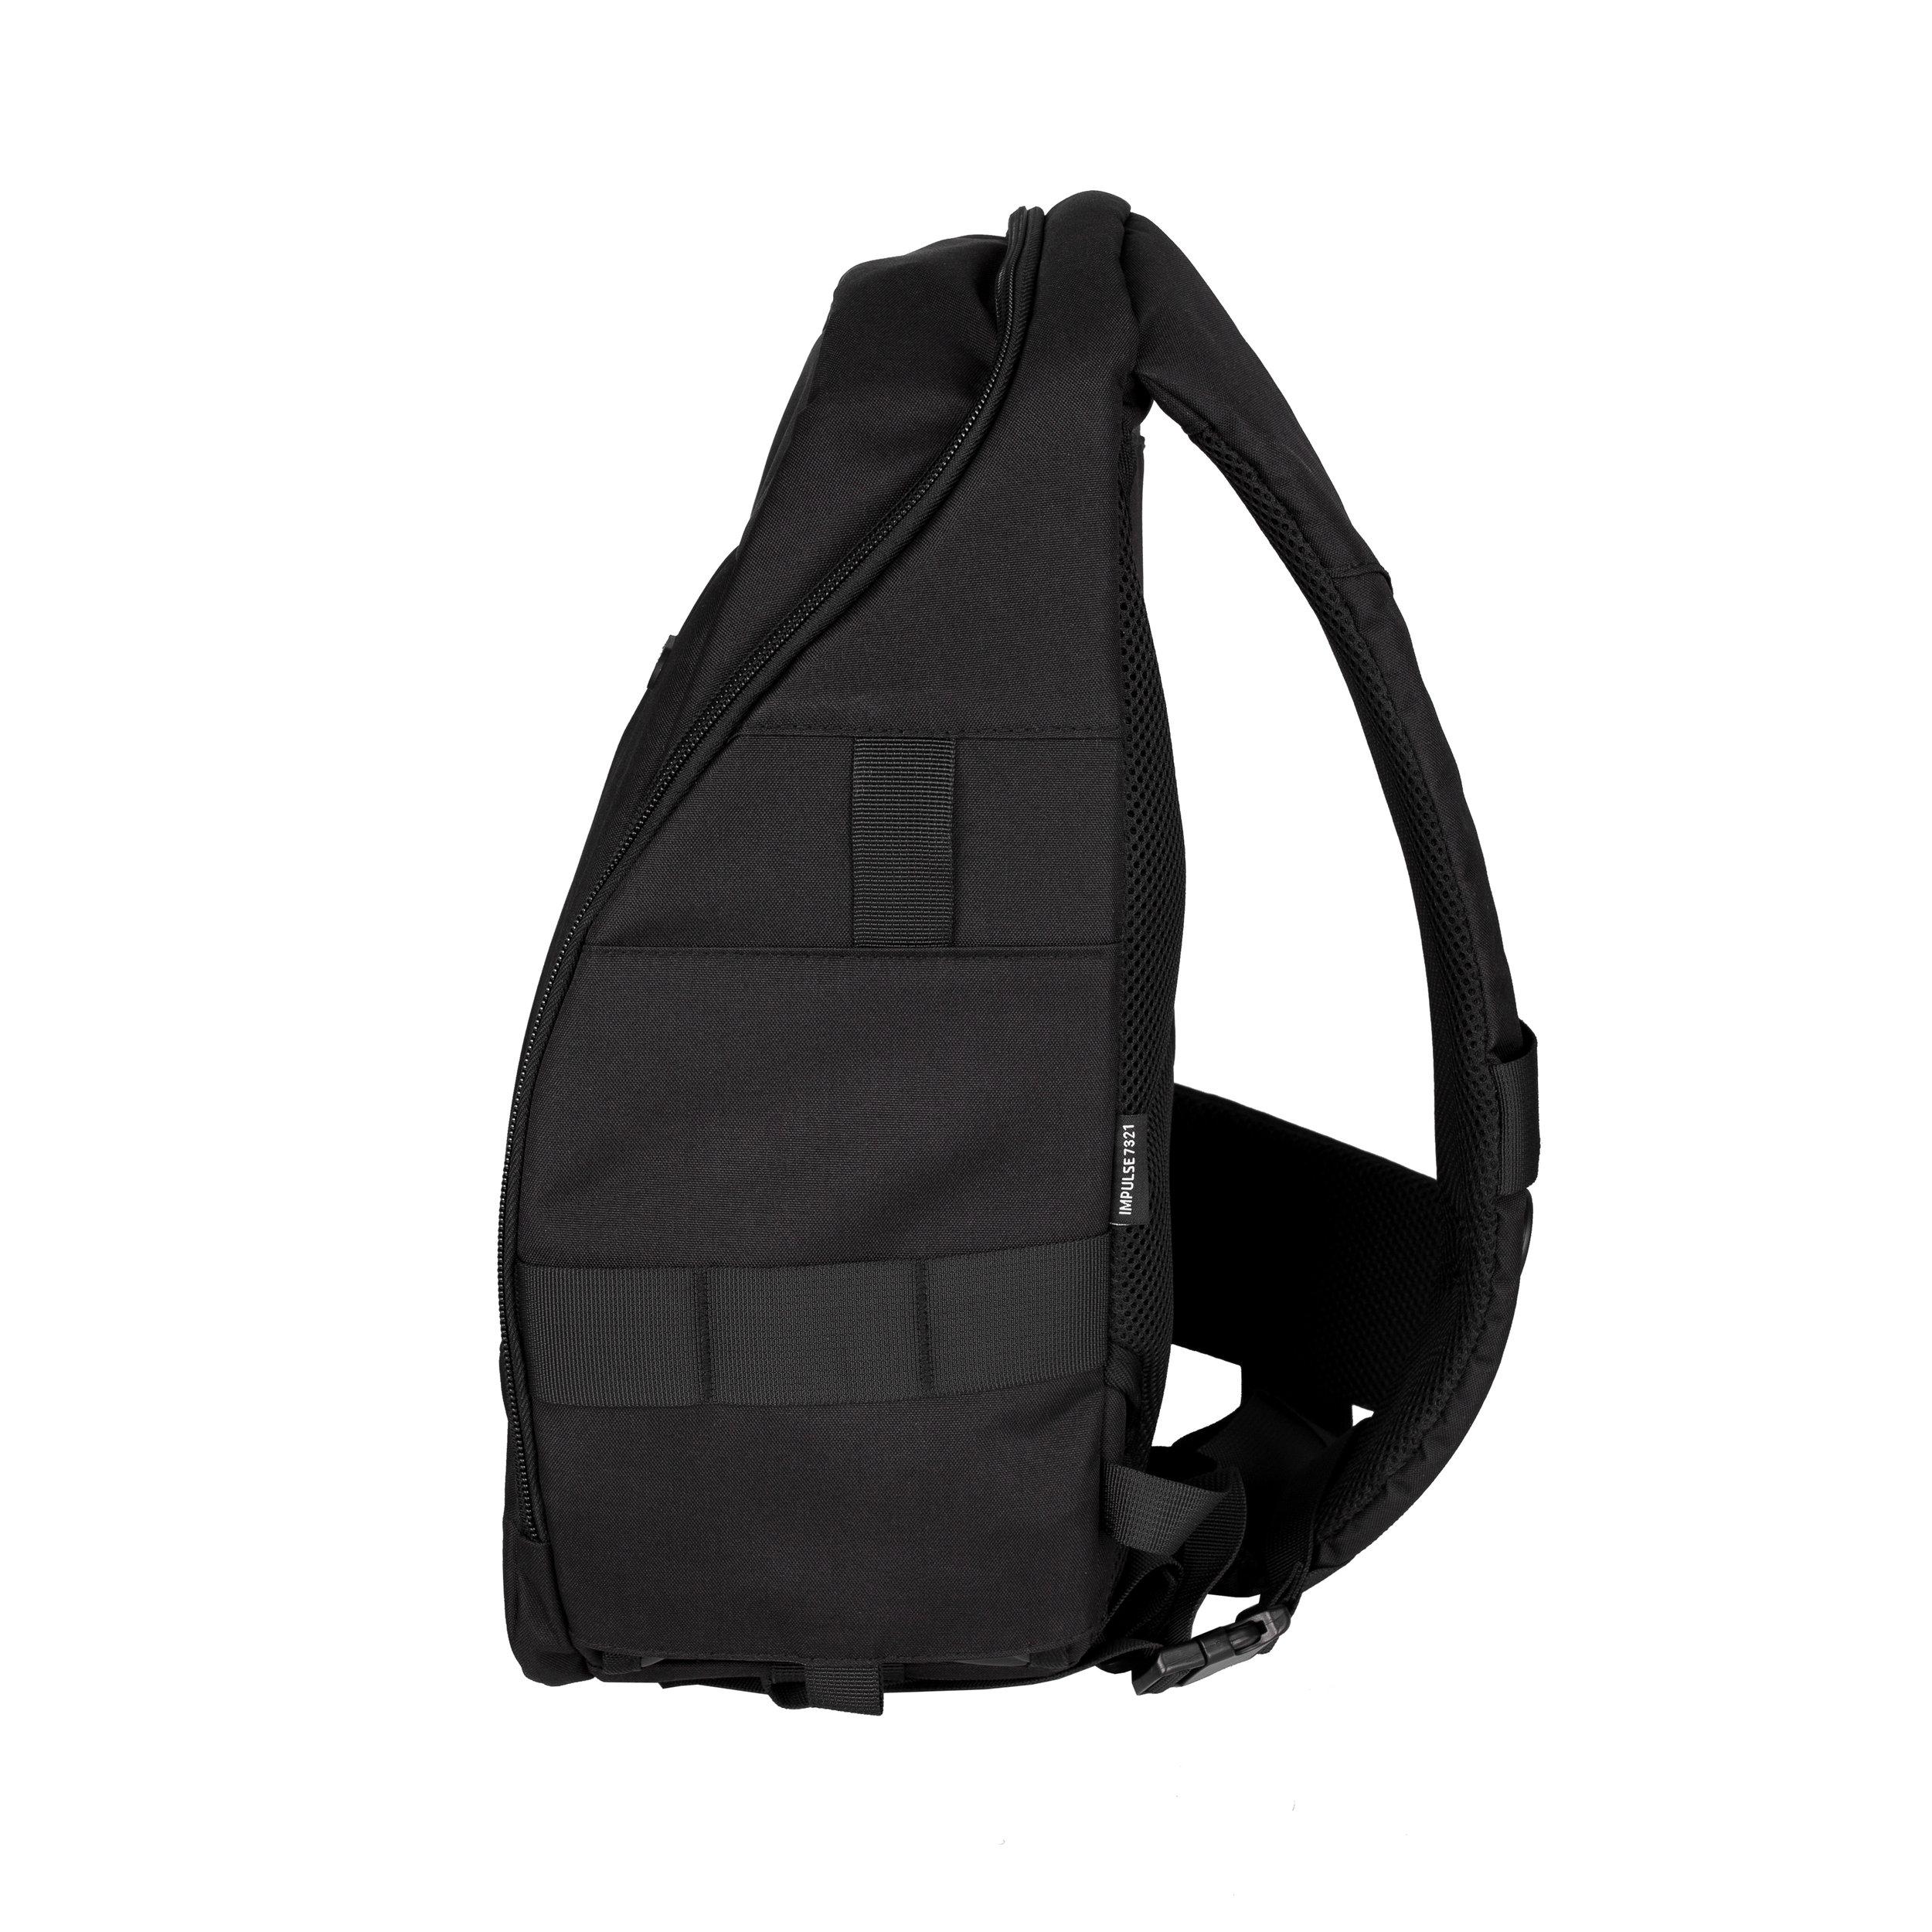 Promaster Impulse Sling Bag Black Large Richmond Camera